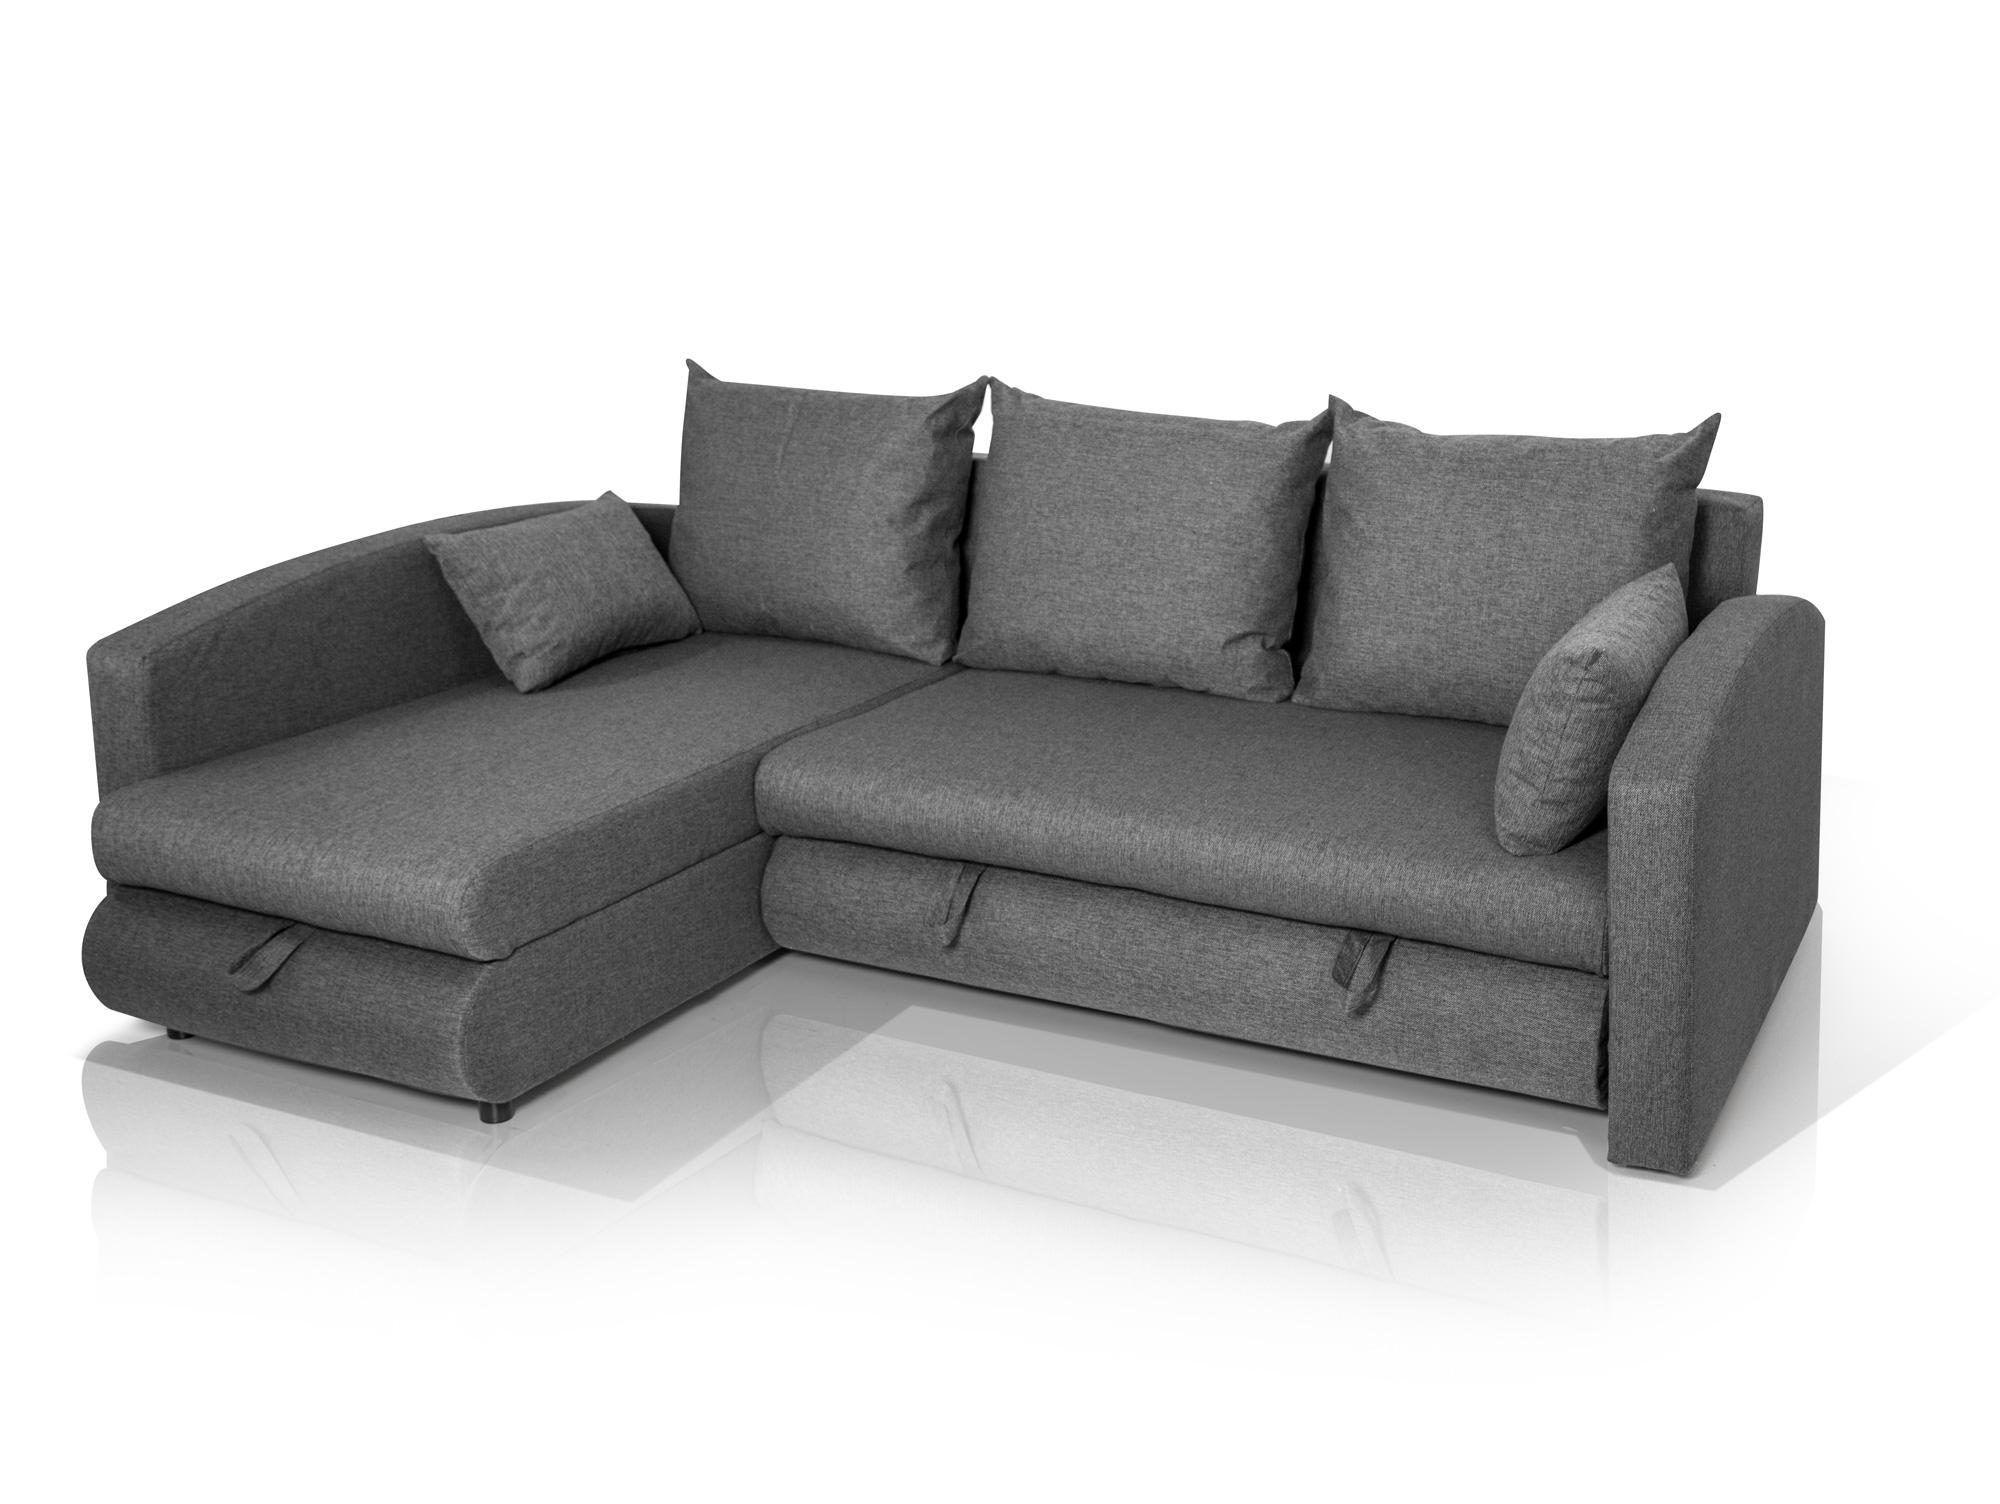 sanja ecksofa webstoff grau. Black Bedroom Furniture Sets. Home Design Ideas